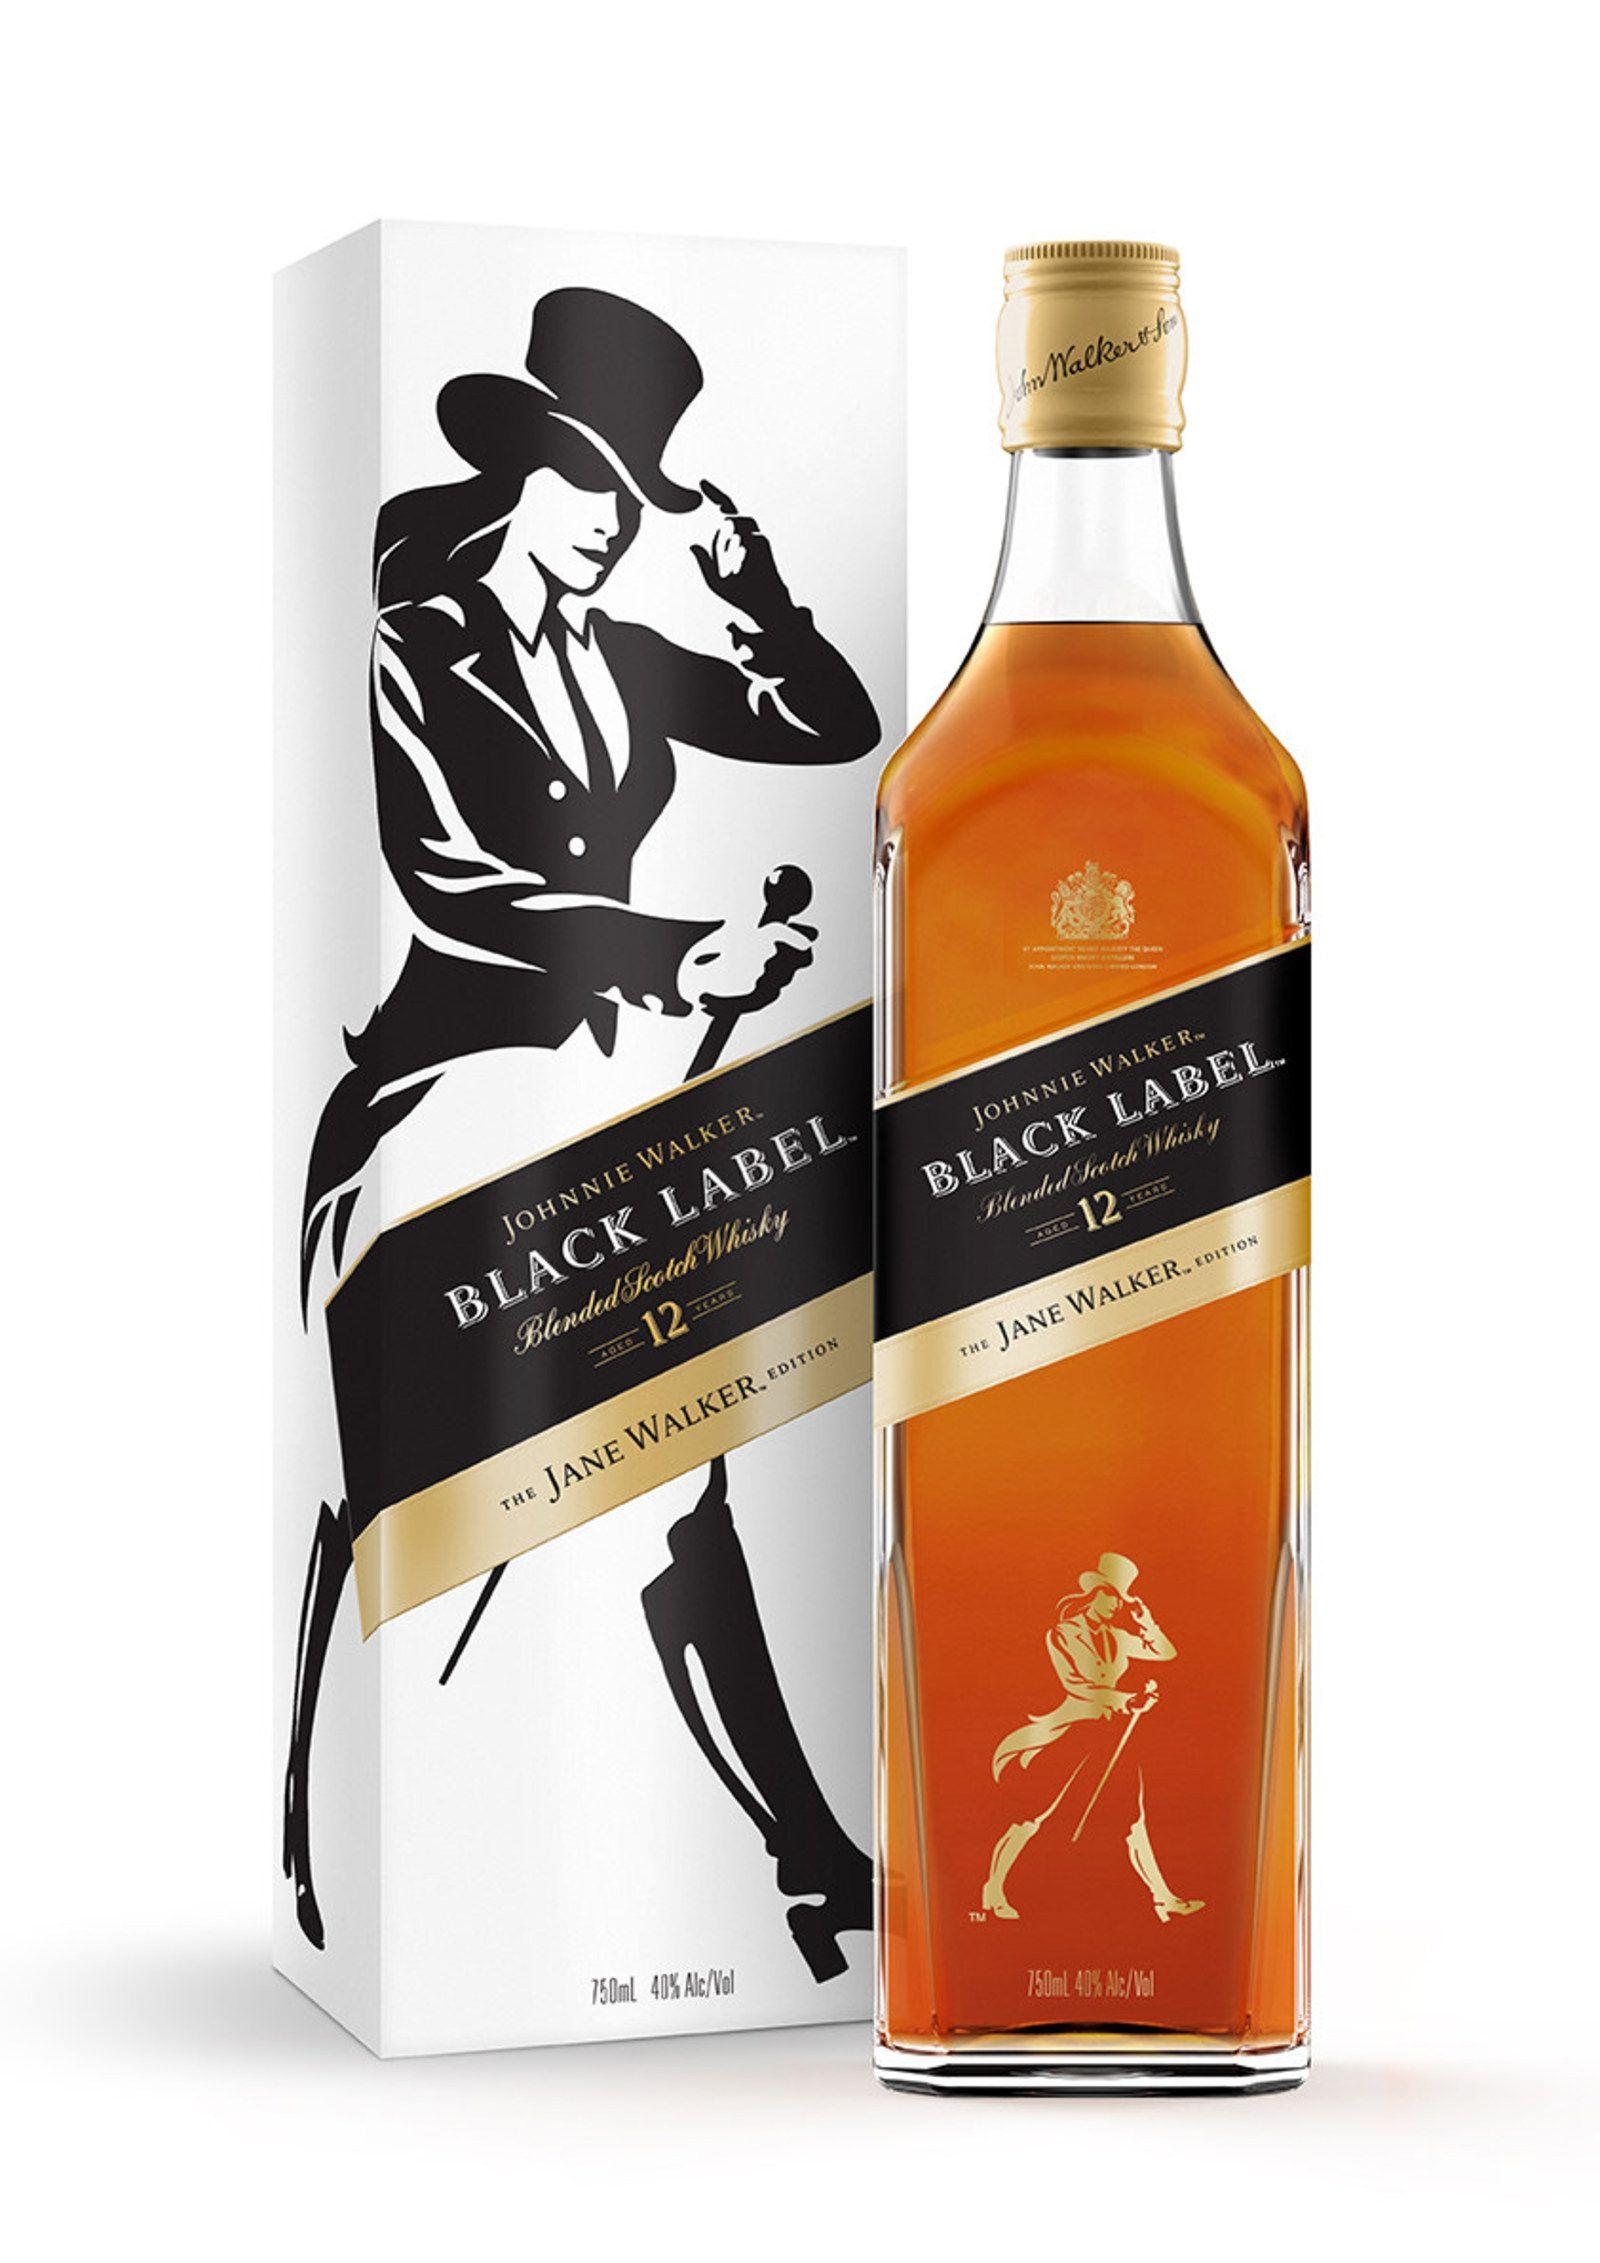 Jane Walker Whisky Johnnie Walker Black Johnnie Walker Black